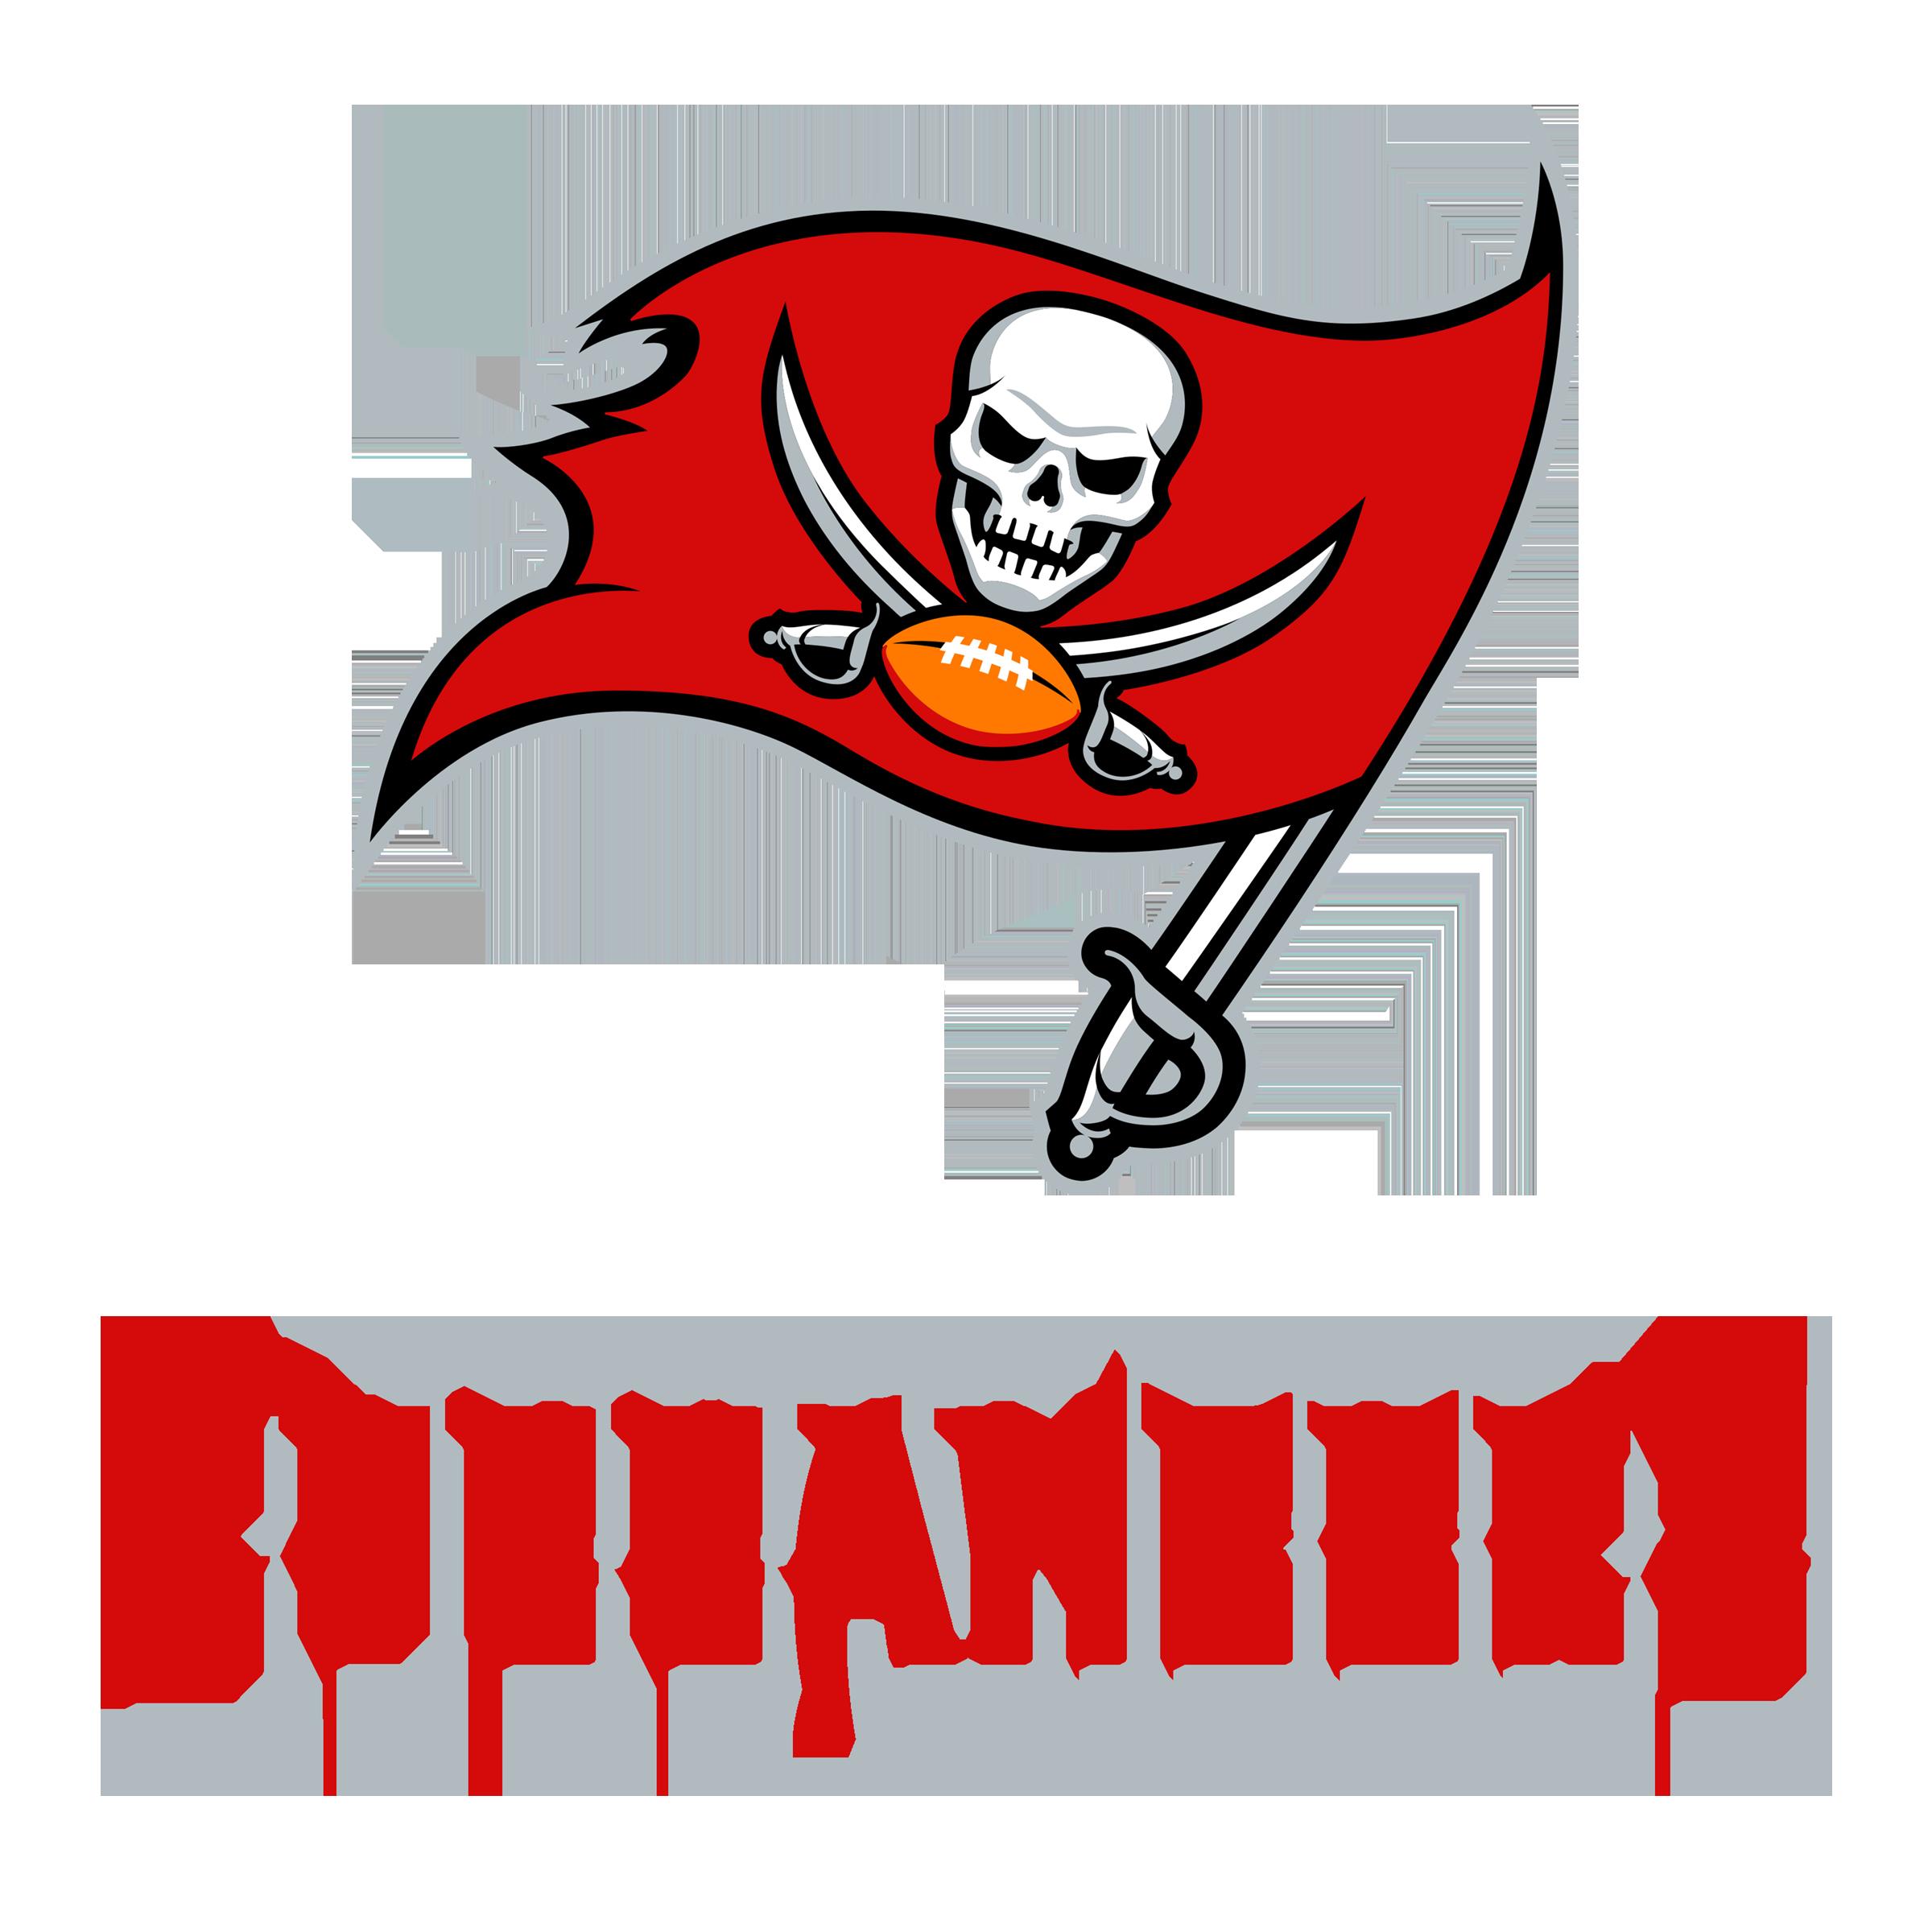 Tampa Bay Buccaneers Flag Logo Png 2 400 2 400 Pixels Tampa Bay Buccaneers Tampa Bay Buccaneers Logo Tampa Bay Bucs